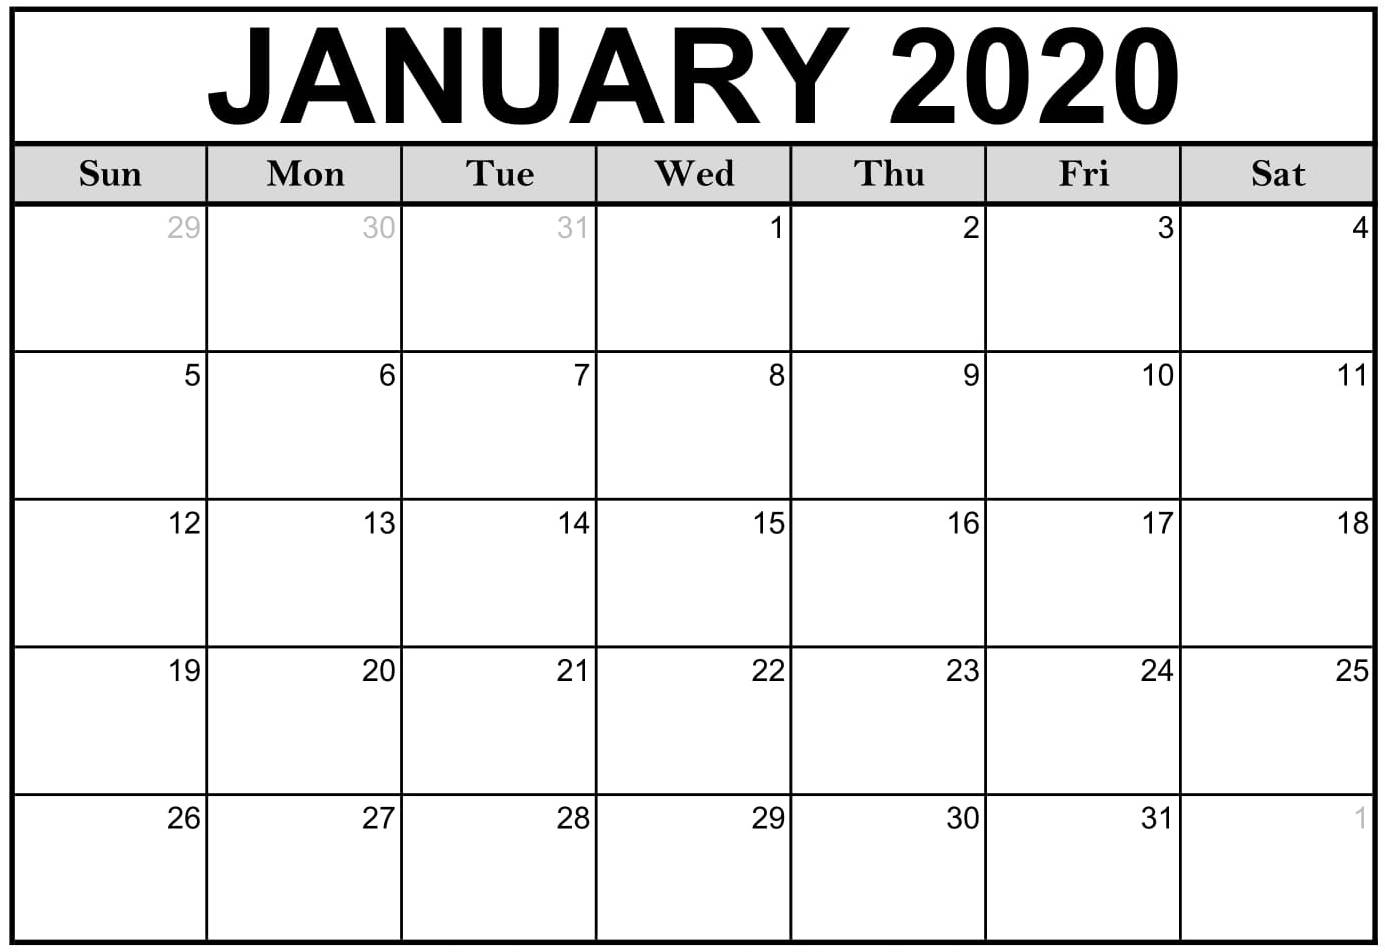 Free Printable January 2020 Calendar Editable Datesheets for Free Editable 2020 Calendars